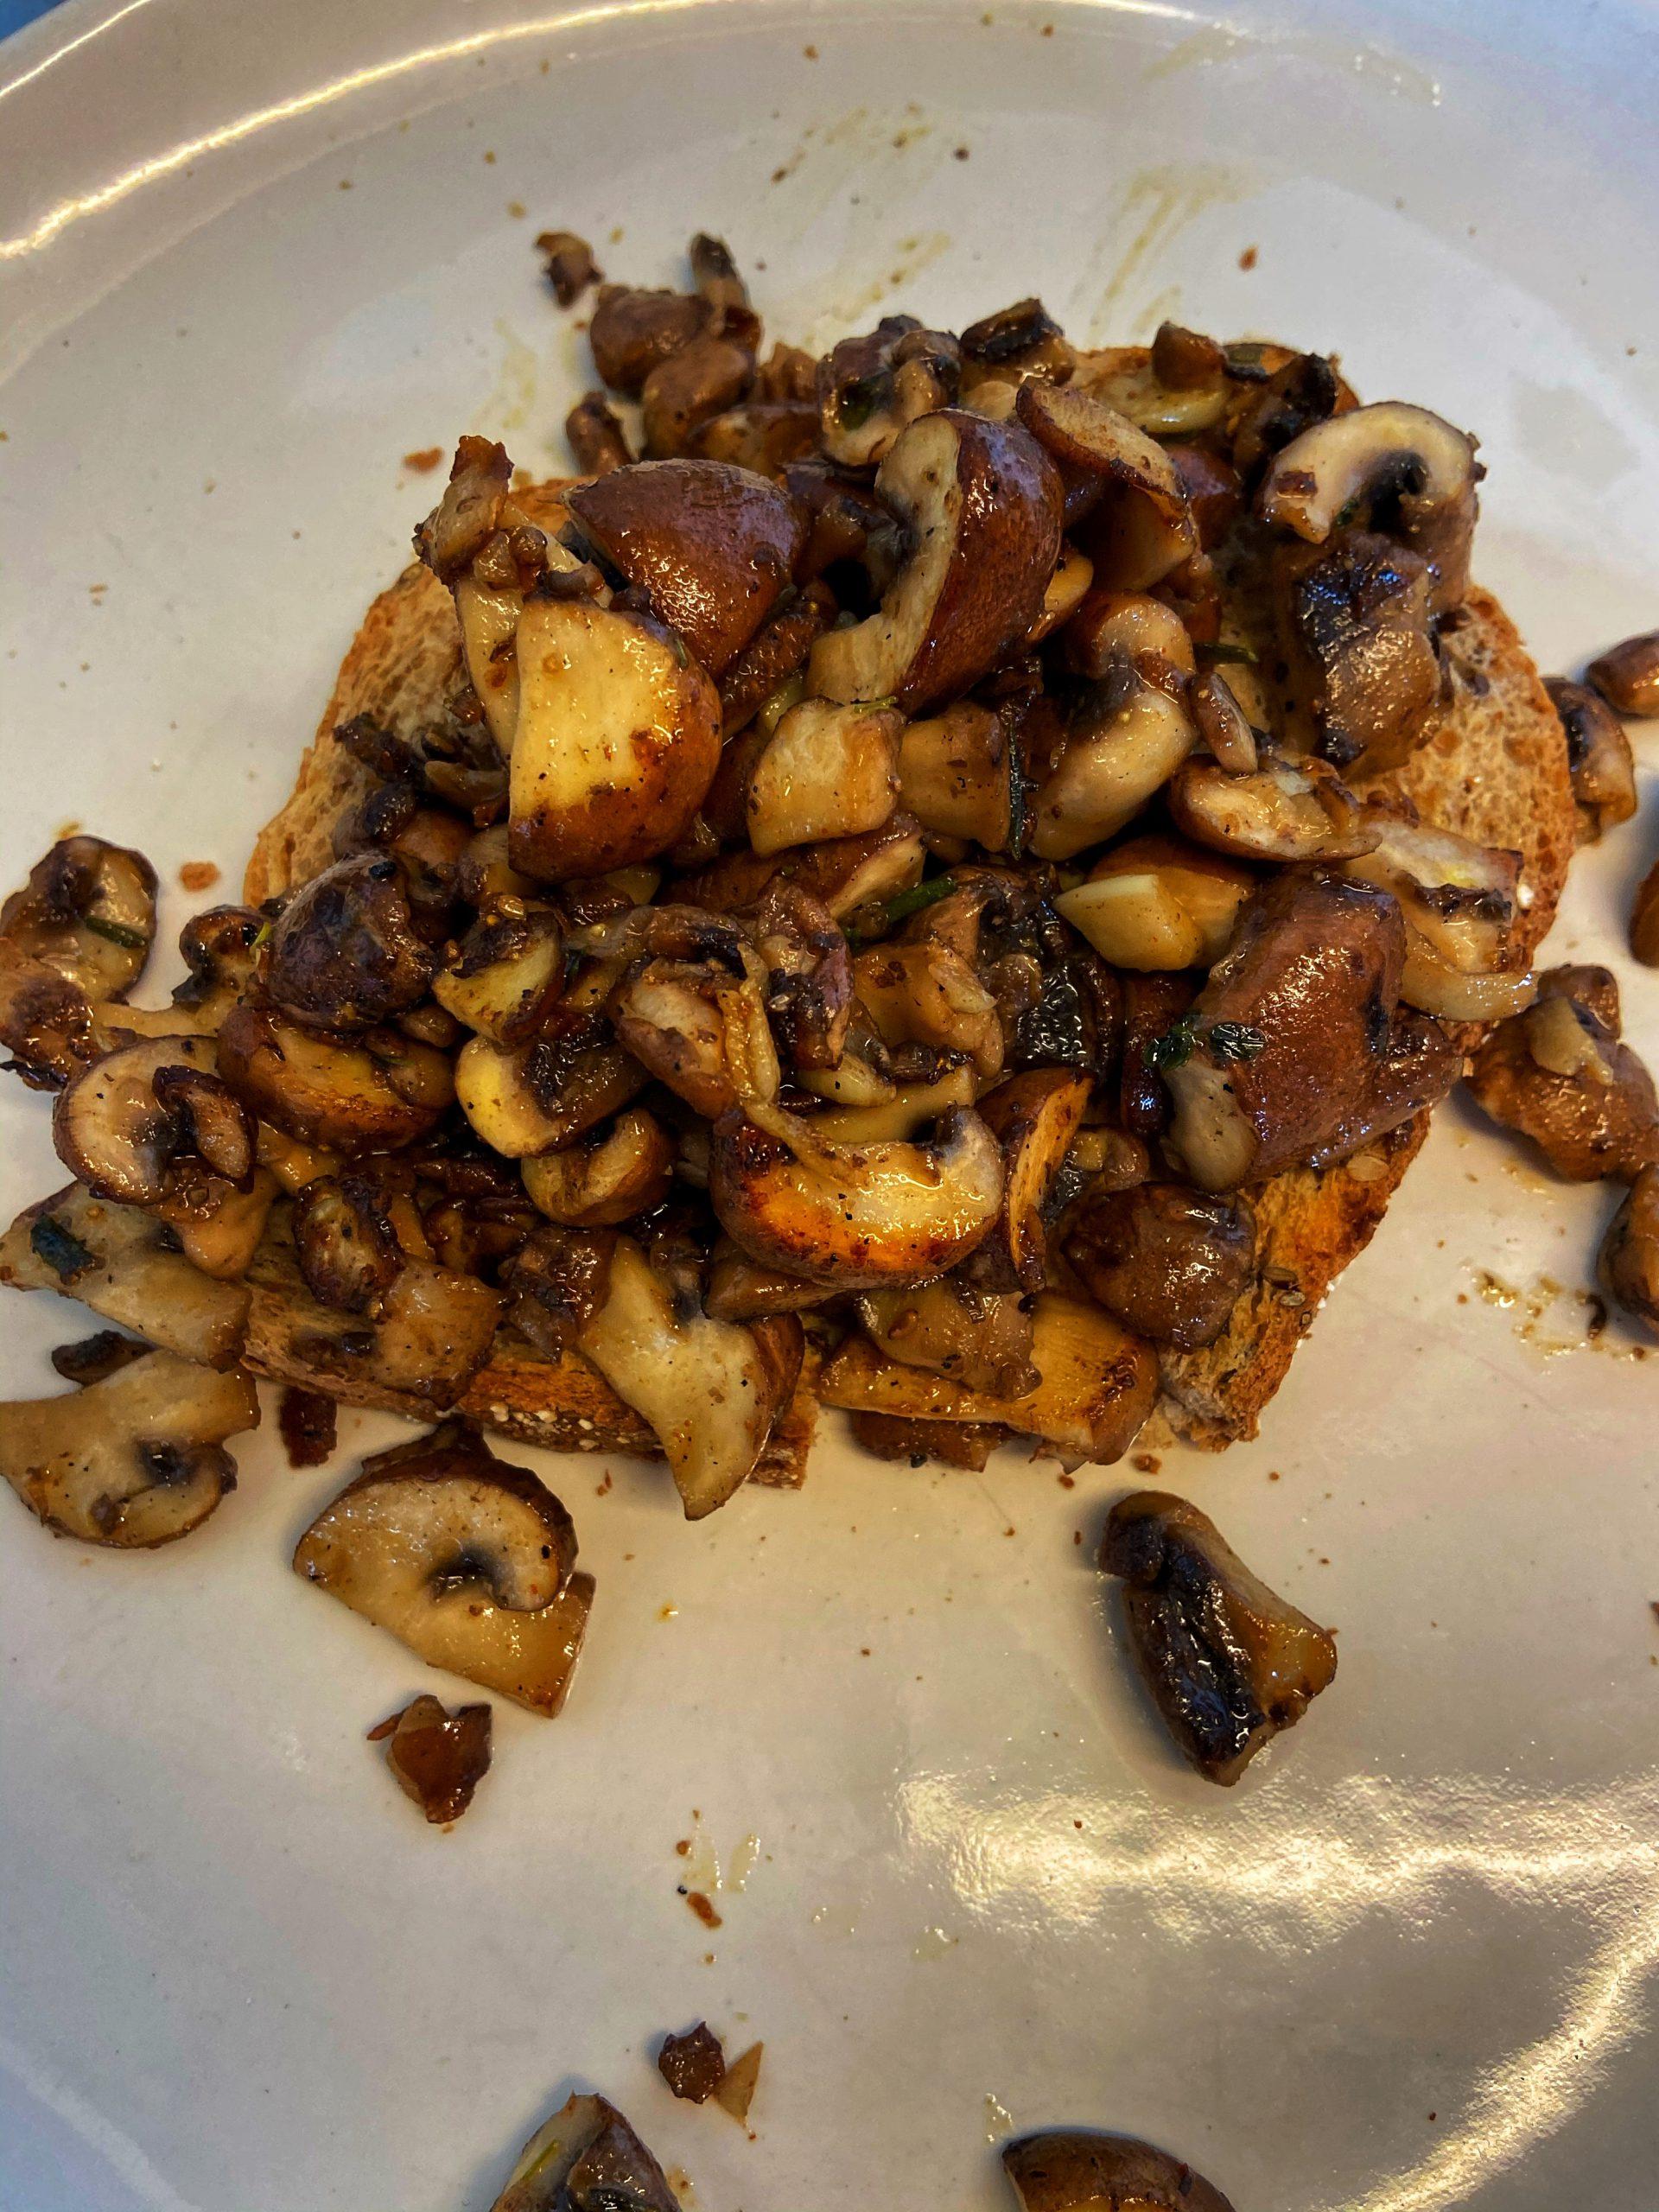 Toast champignon voorgerecht